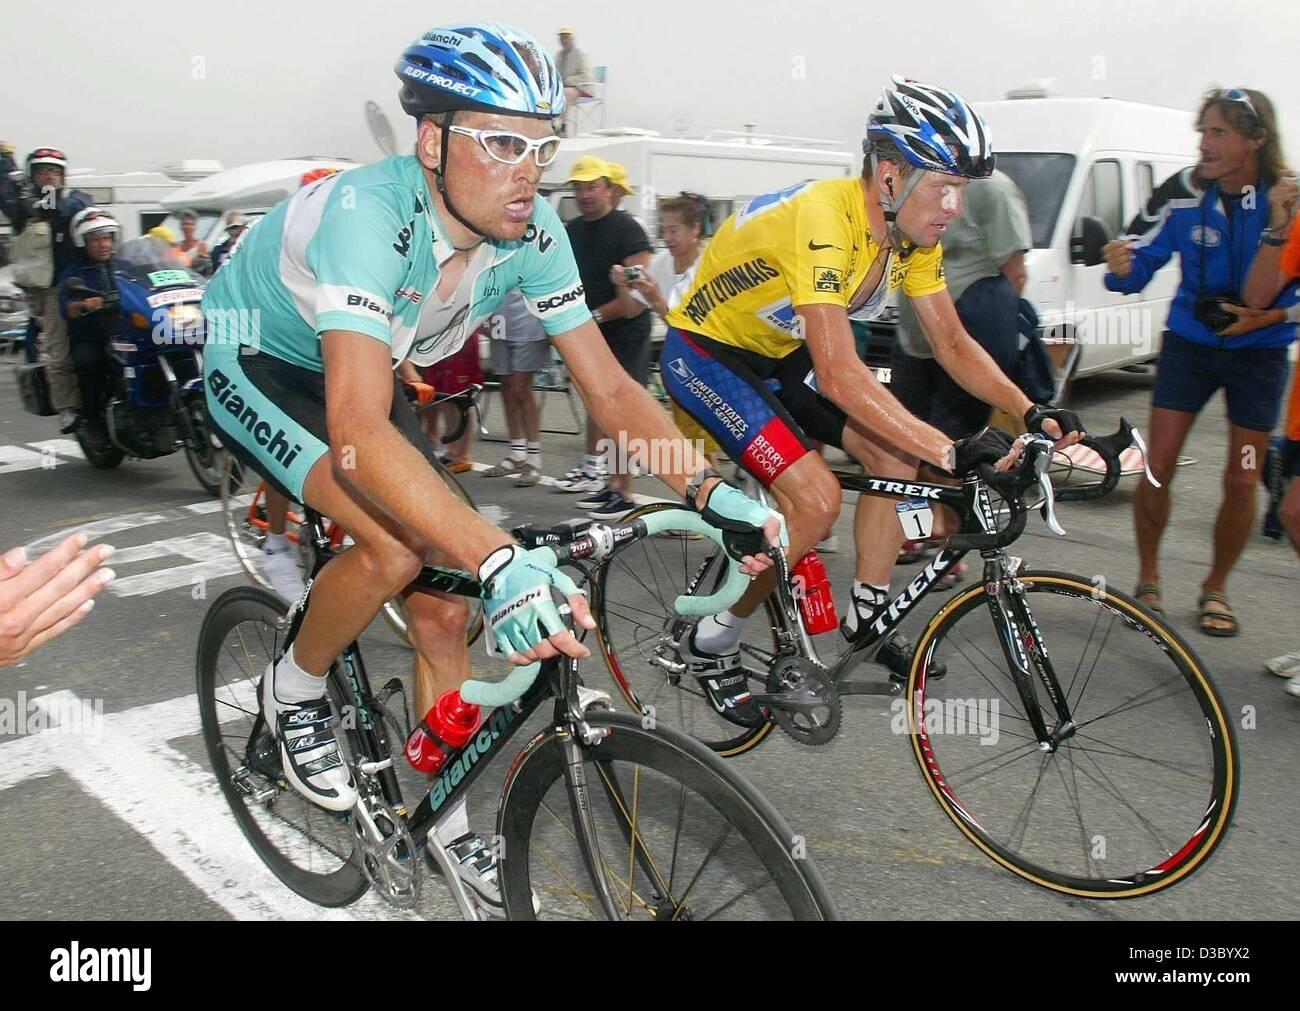 (dpa) - German cyclist Jan Ullrich of Team Bianchi in a head to head 1e616f670